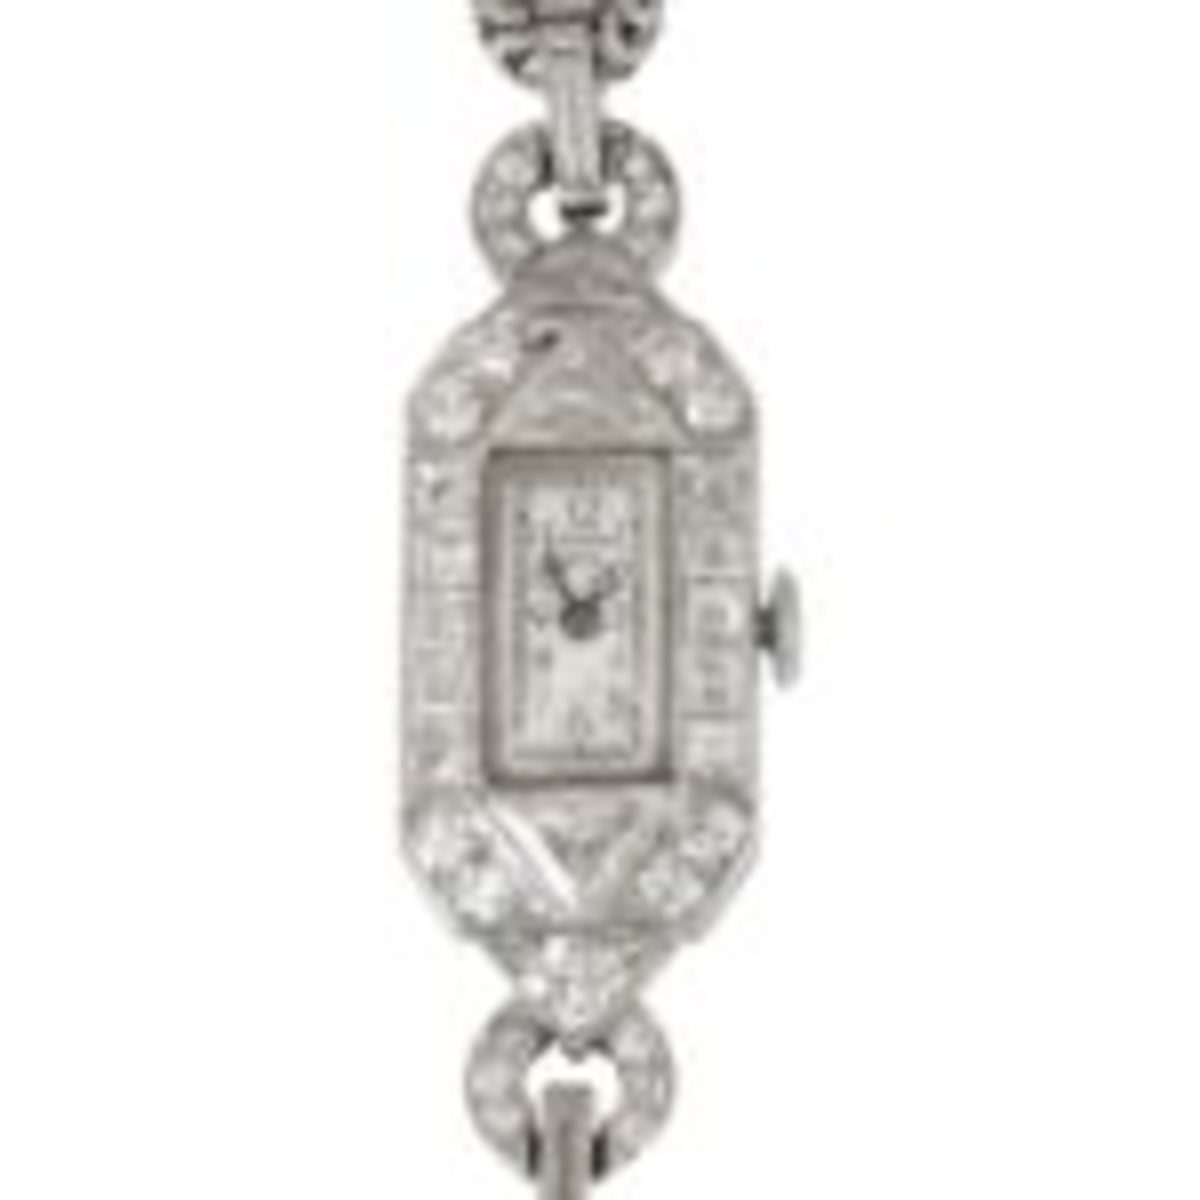 Luxury watch by Tiffany & Co.